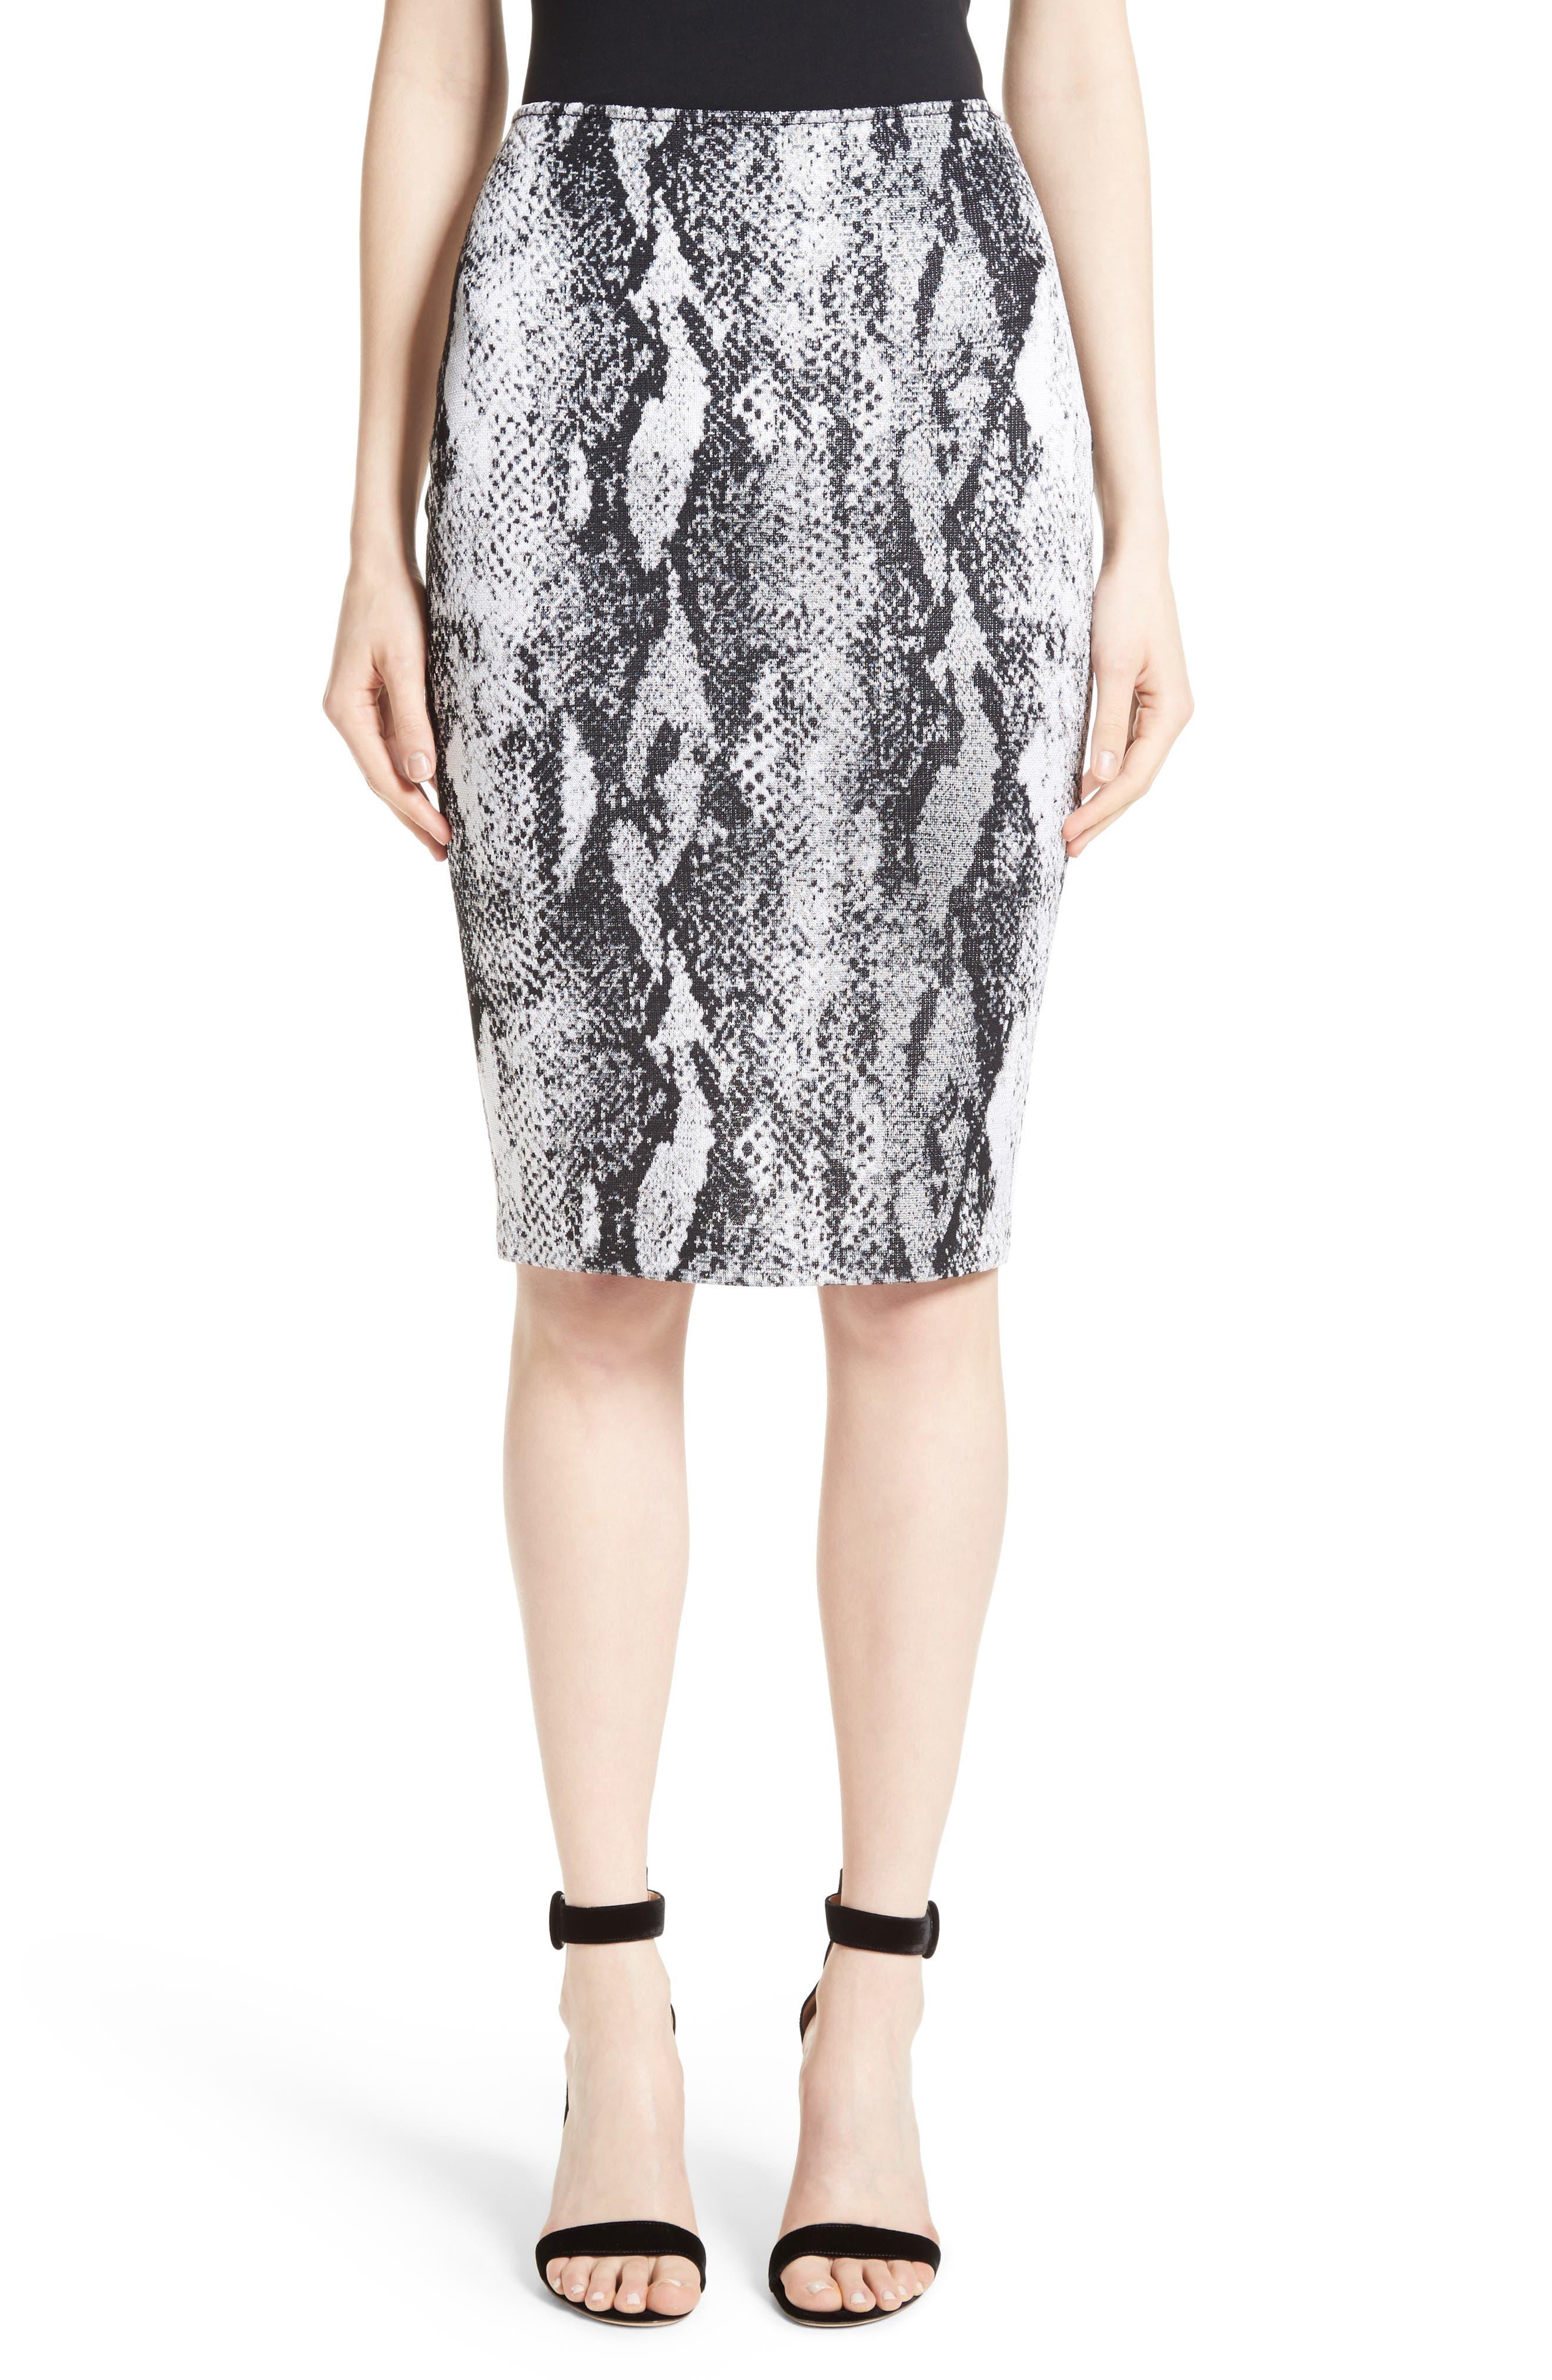 St. John Collection Raja Snakeskin Knit Pencil Skirt